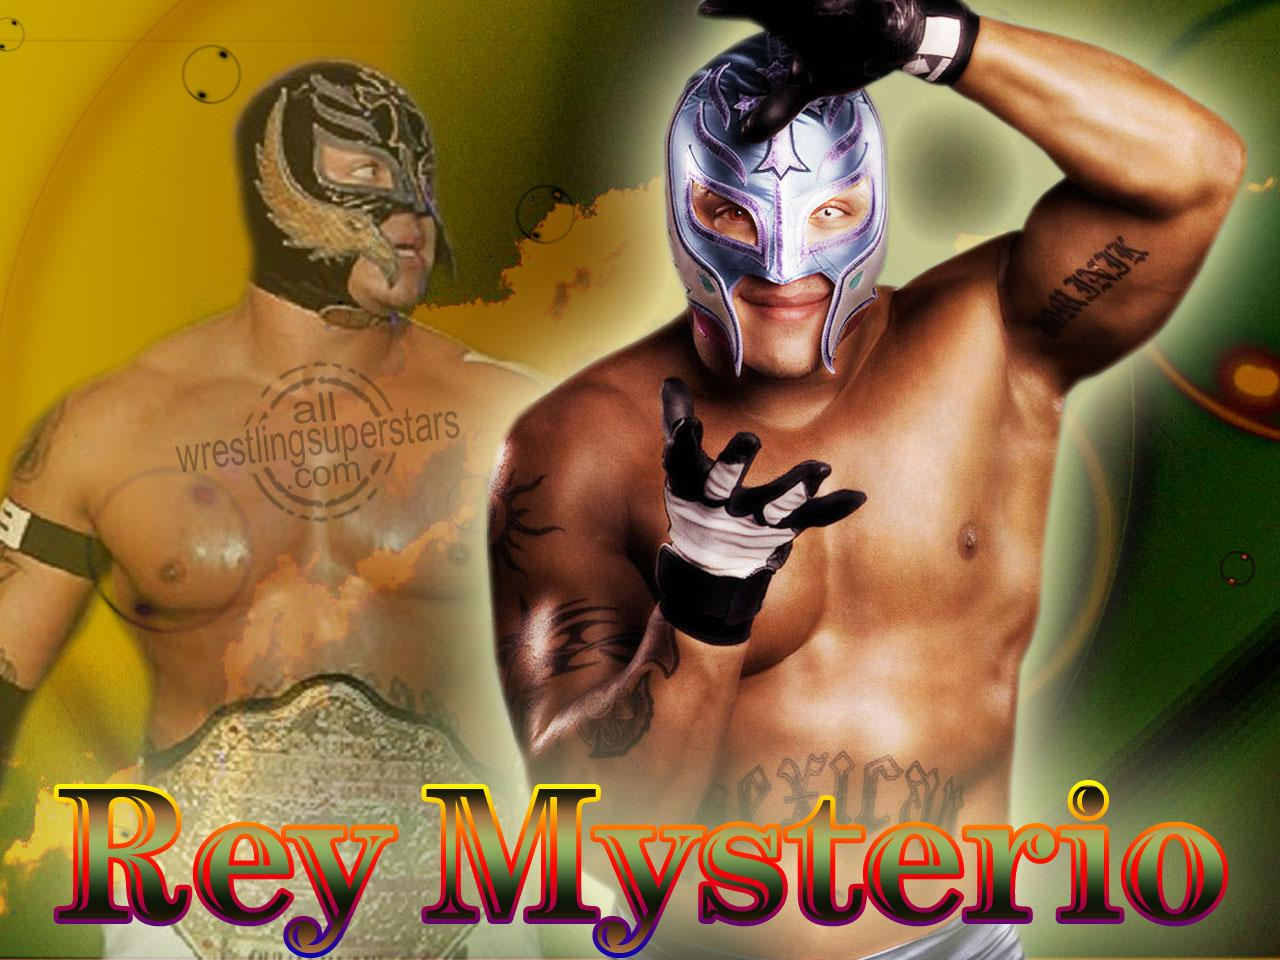 http://1.bp.blogspot.com/-s18a-vnkni4/Tx-aU4rLTnI/AAAAAAAAKMQ/CejFgWy55ik/s1600/wwe-wallpapers-rey-mysterio-7.jpg